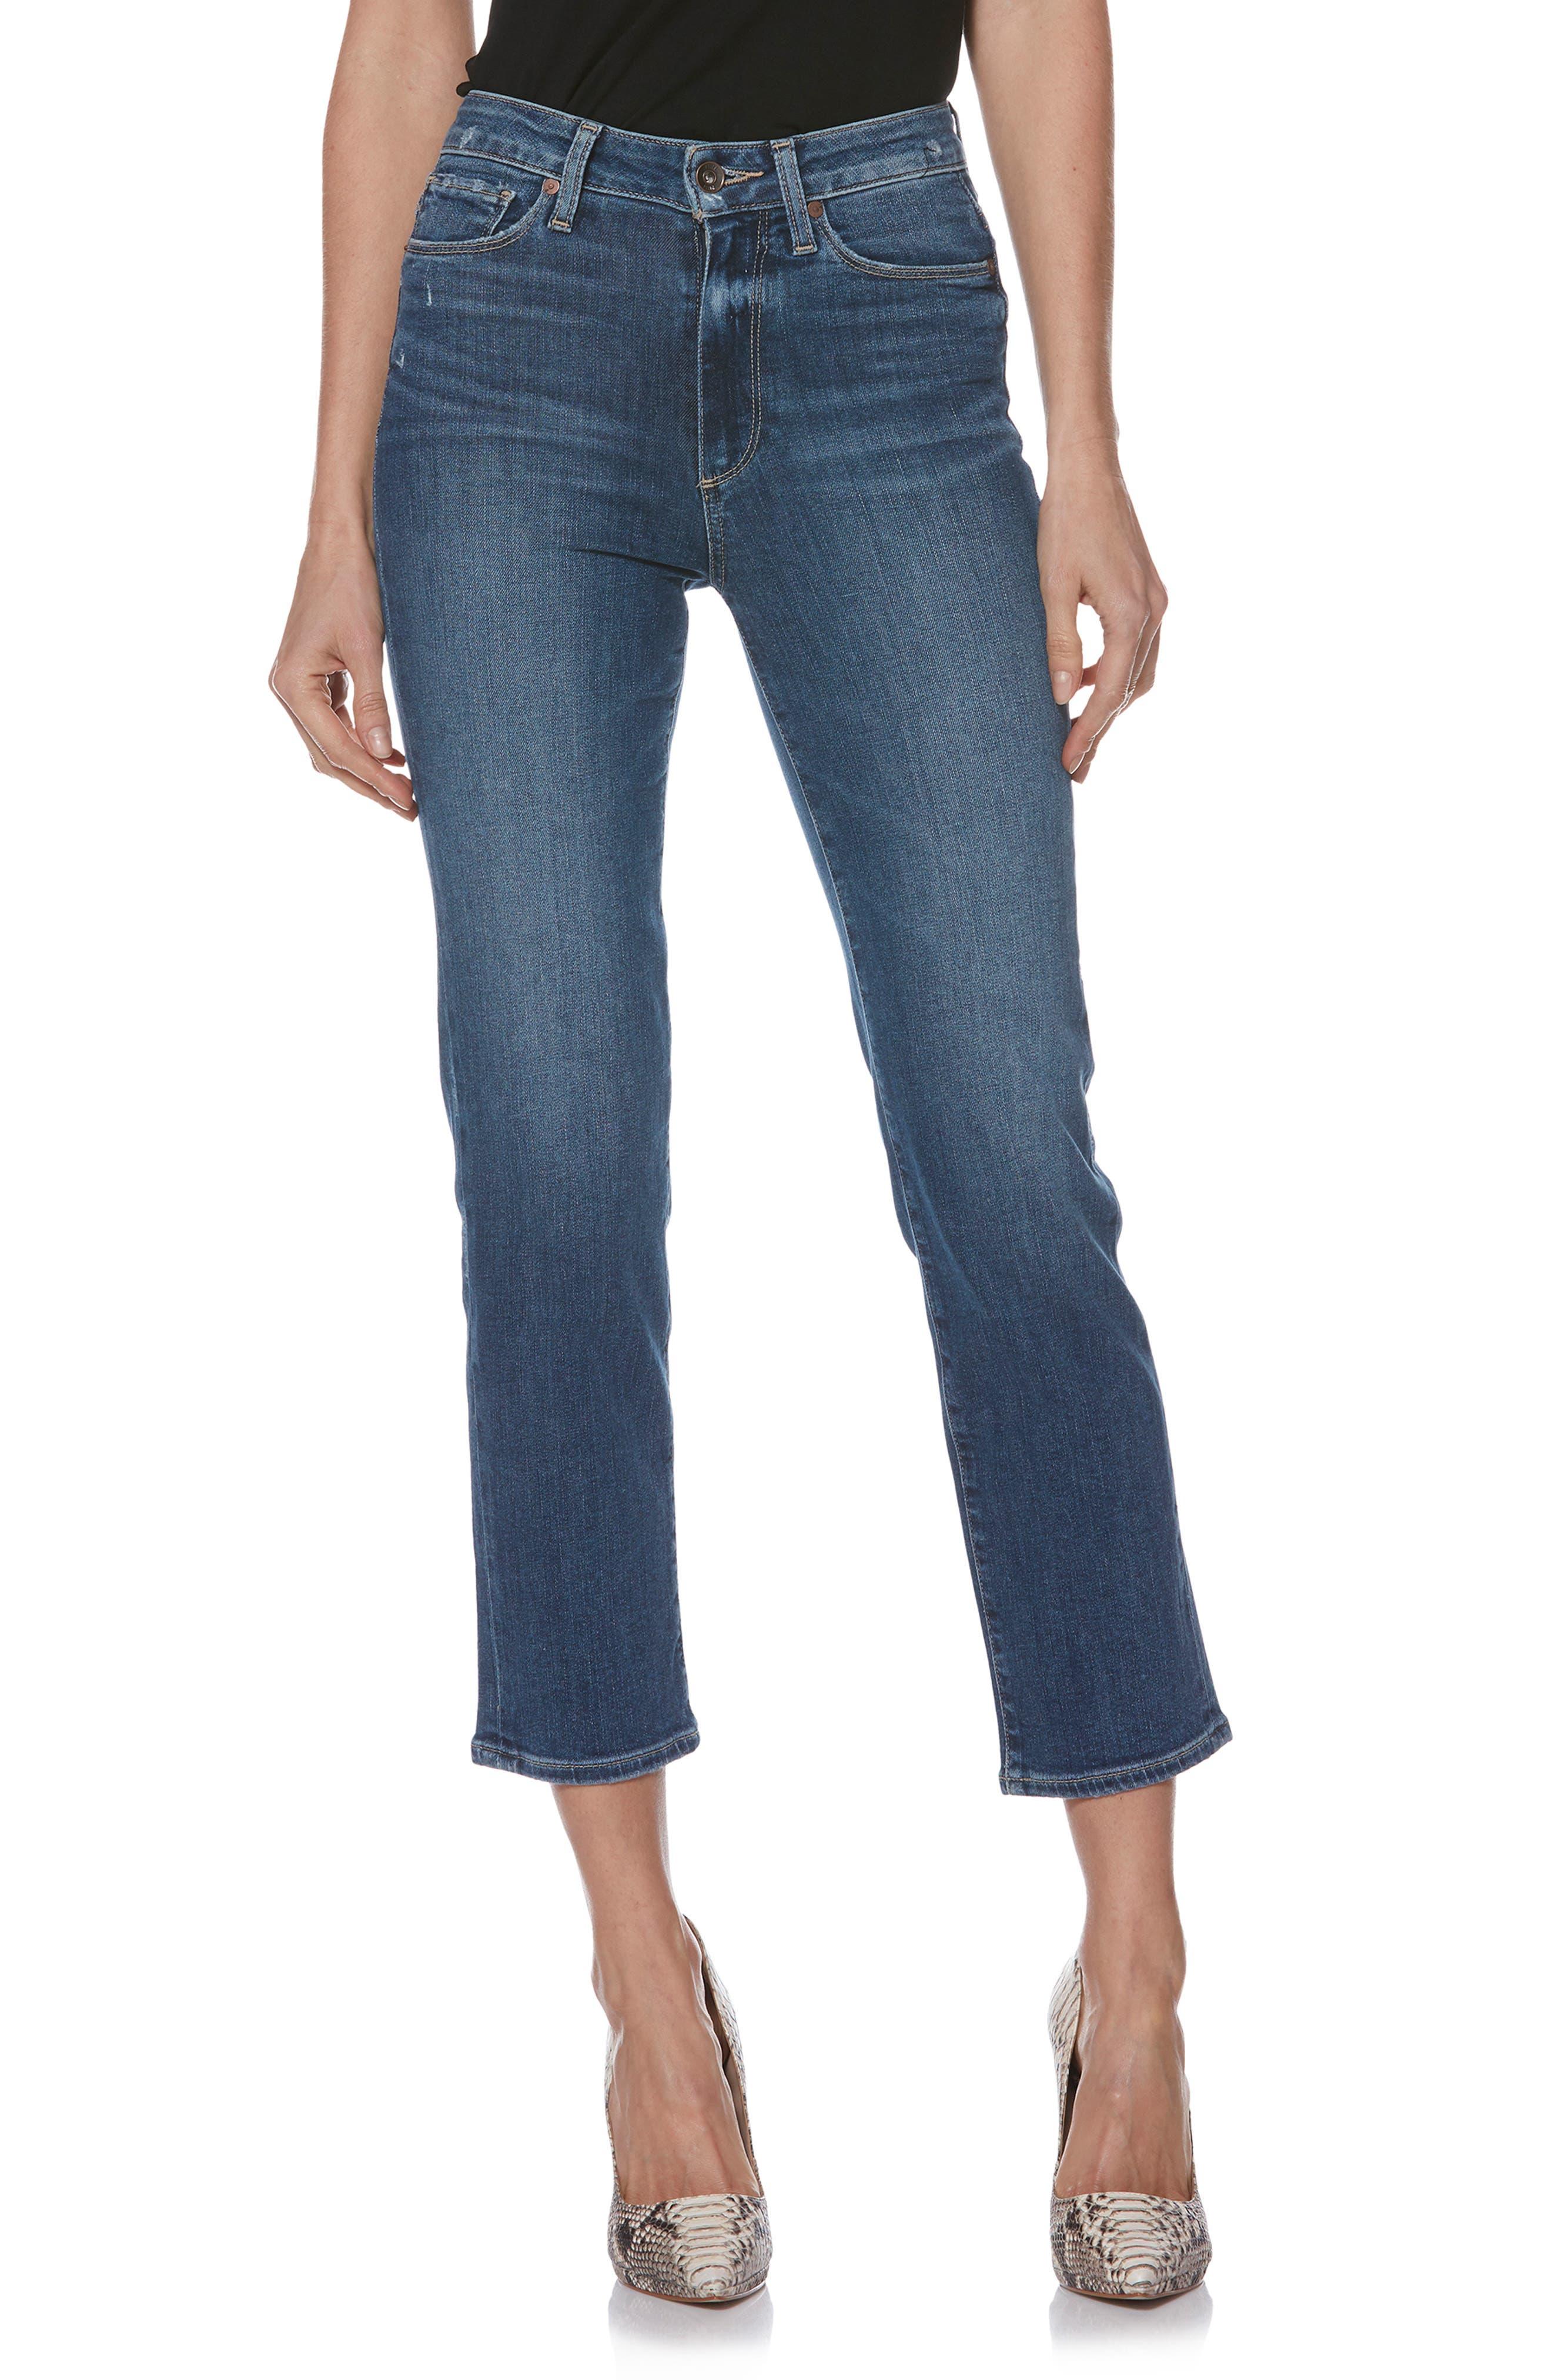 Transcend Vintage - Margot High Waist Ankle Straight Leg Jeans,                             Alternate thumbnail 5, color,                             HANNIE